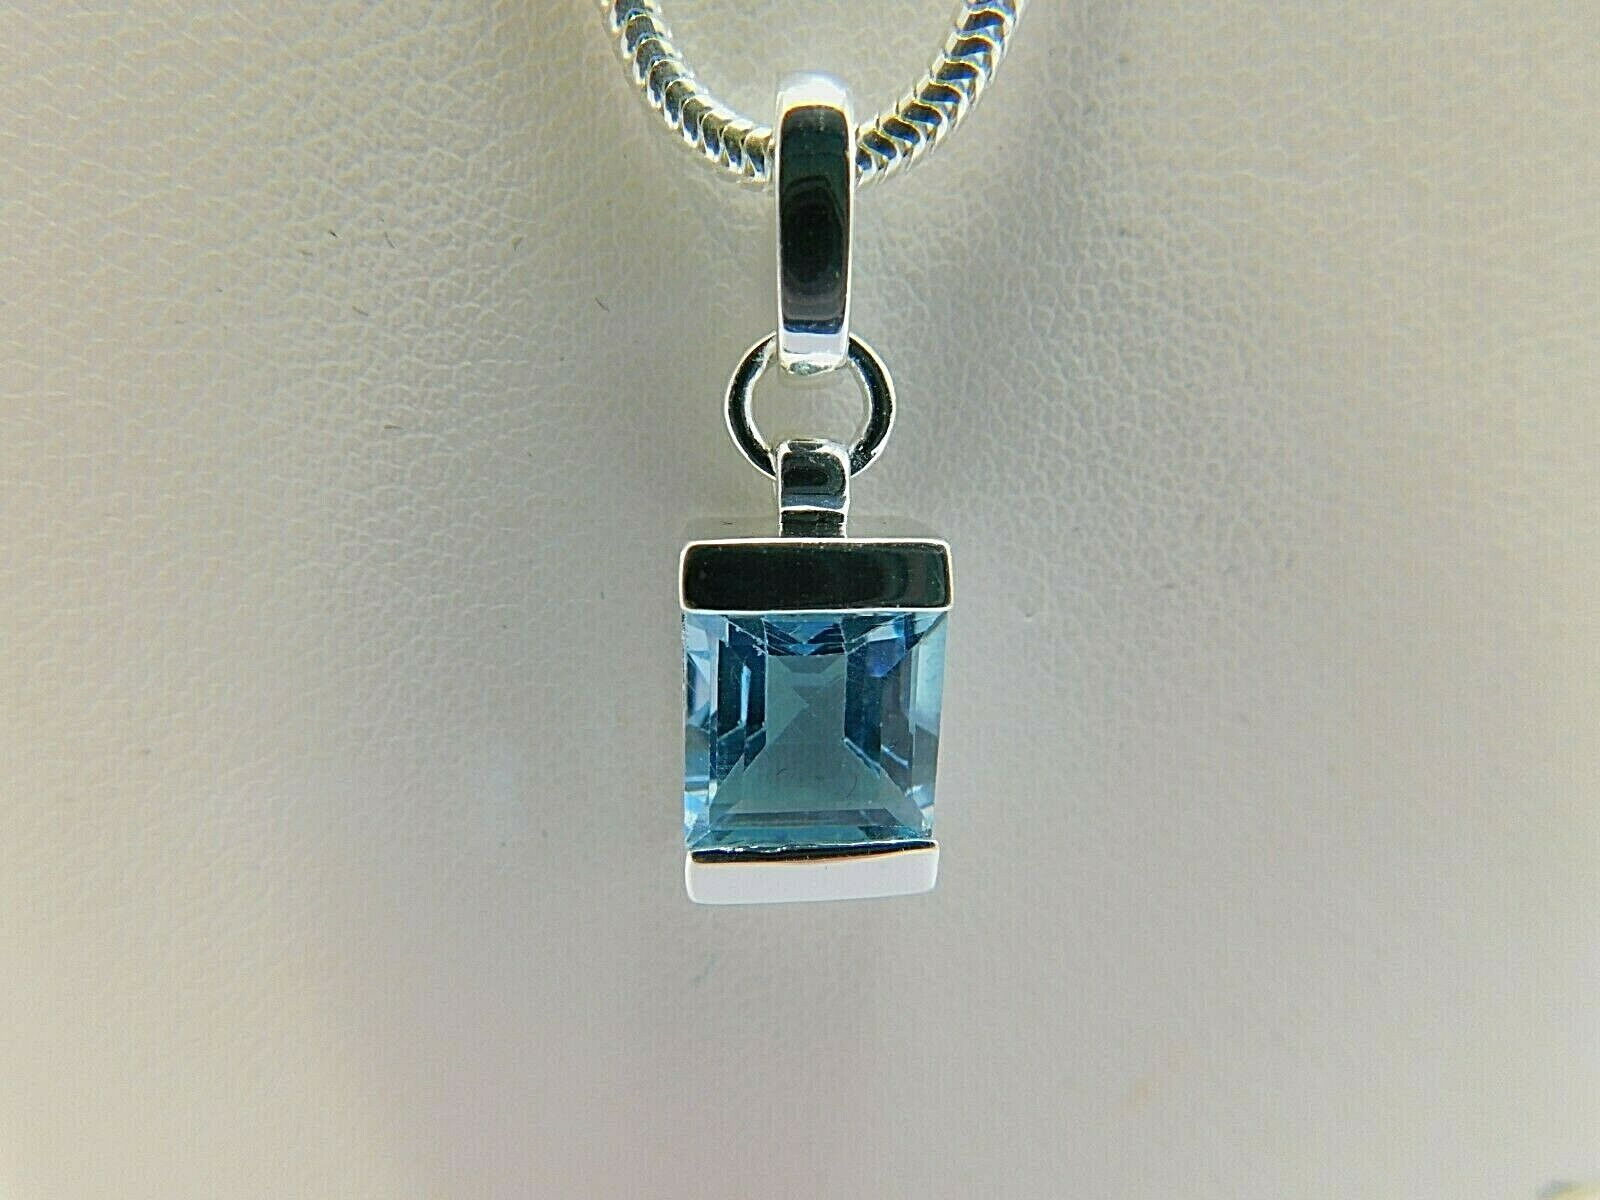 19.12mmx38.30mm Thick Antique Silver toneAntique Bronze Fishhook Connector Pendant CharmFinding,Necklace Bracelet Charm,DIY Accessory